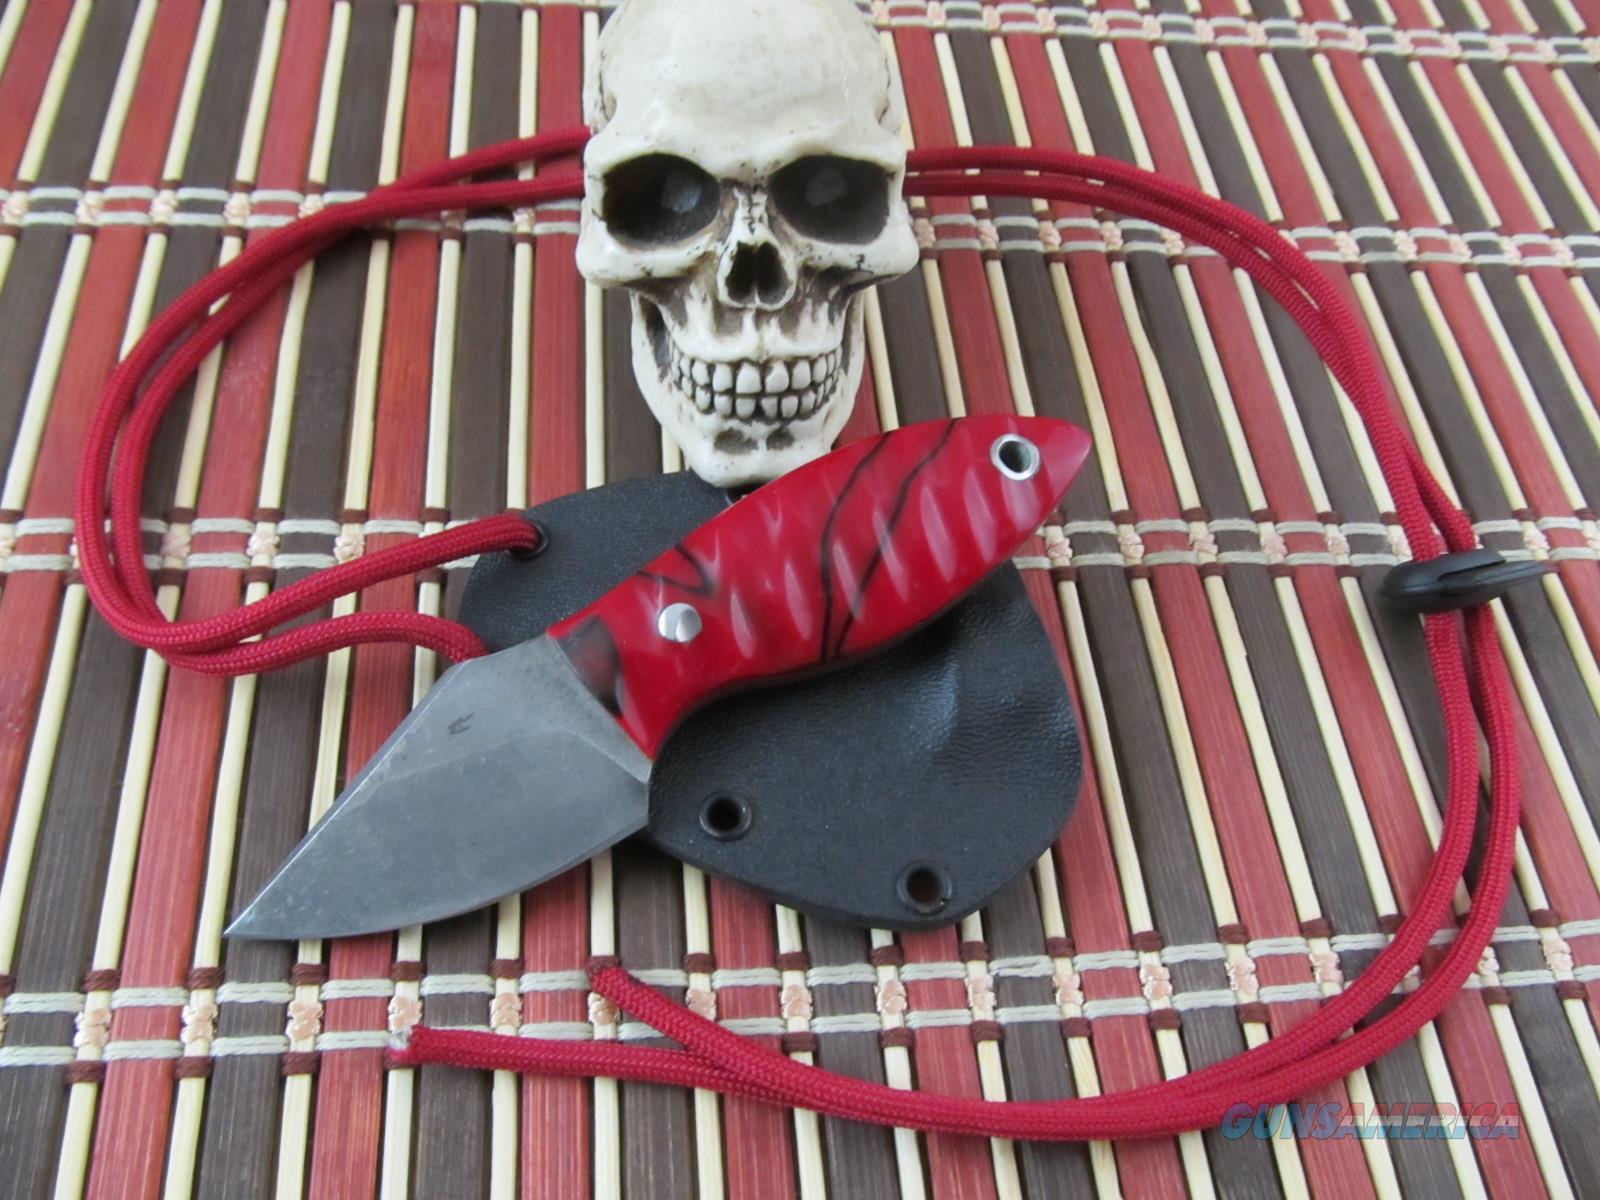 Matt DeClercq Custom Handmade 1084 High Carbon Steel Blade  Non-Guns > Knives/Swords > Knives > Fixed Blade > Hand Made